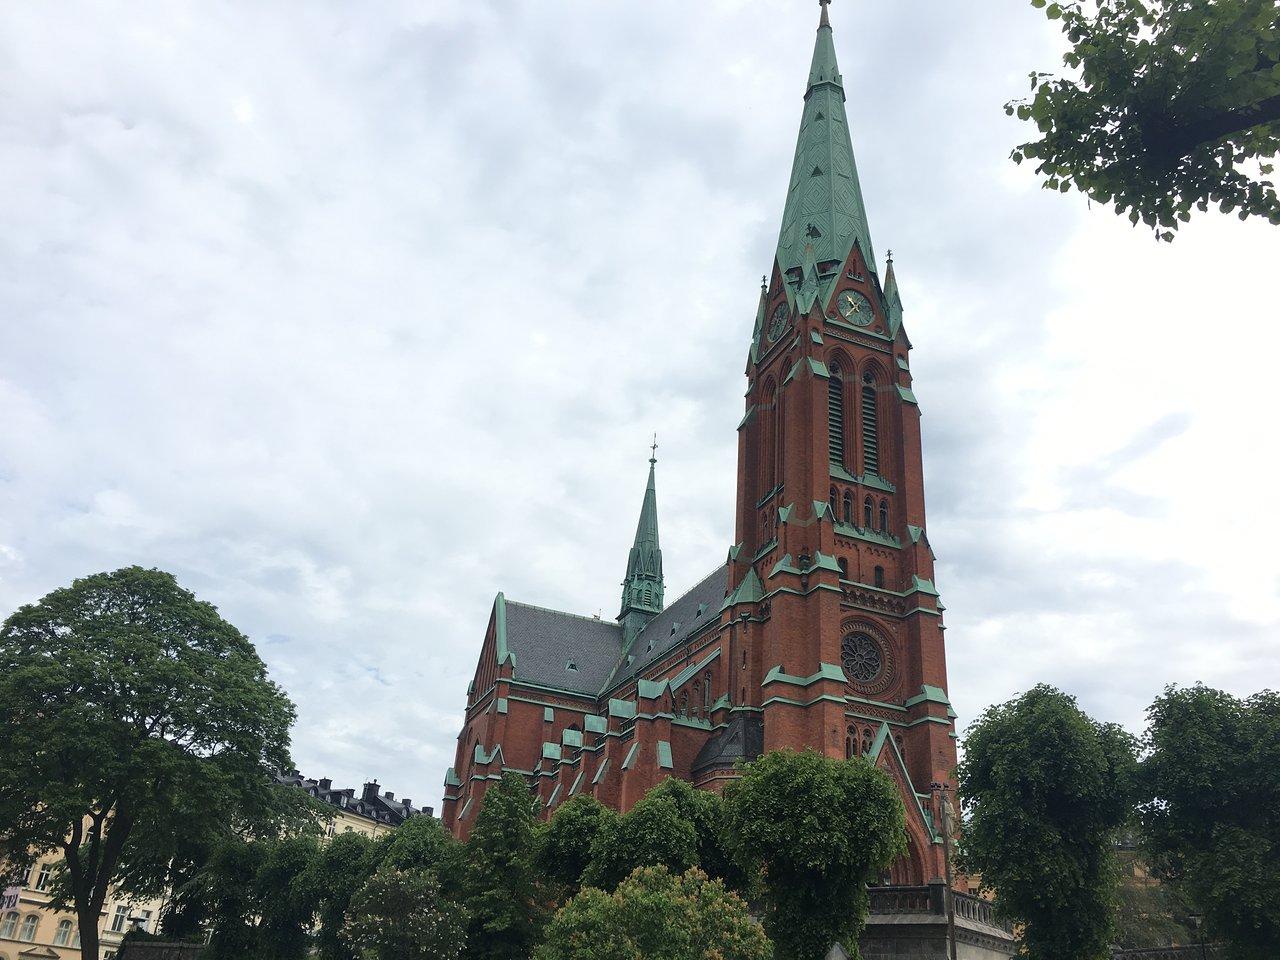 Lagfarter - Norrkpings Tidningar - Nt